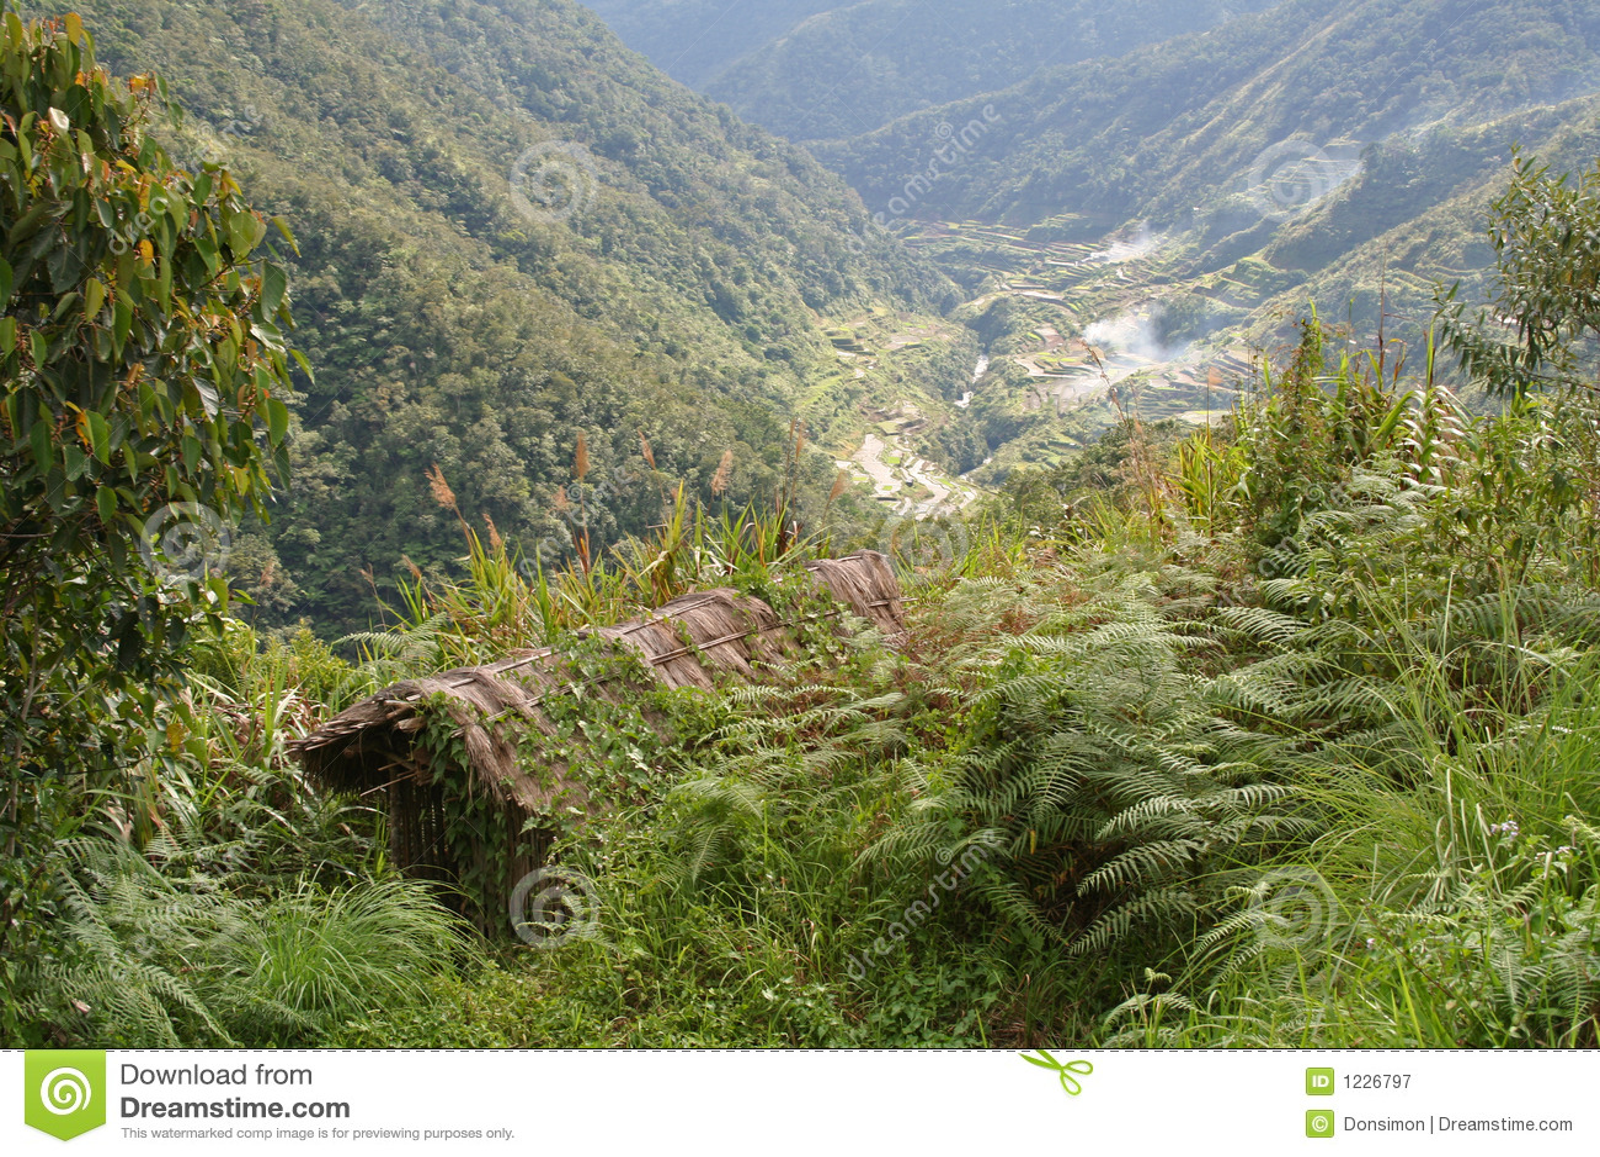 Lofty Perch Philippines Mountain Hut Royalty Free Stock